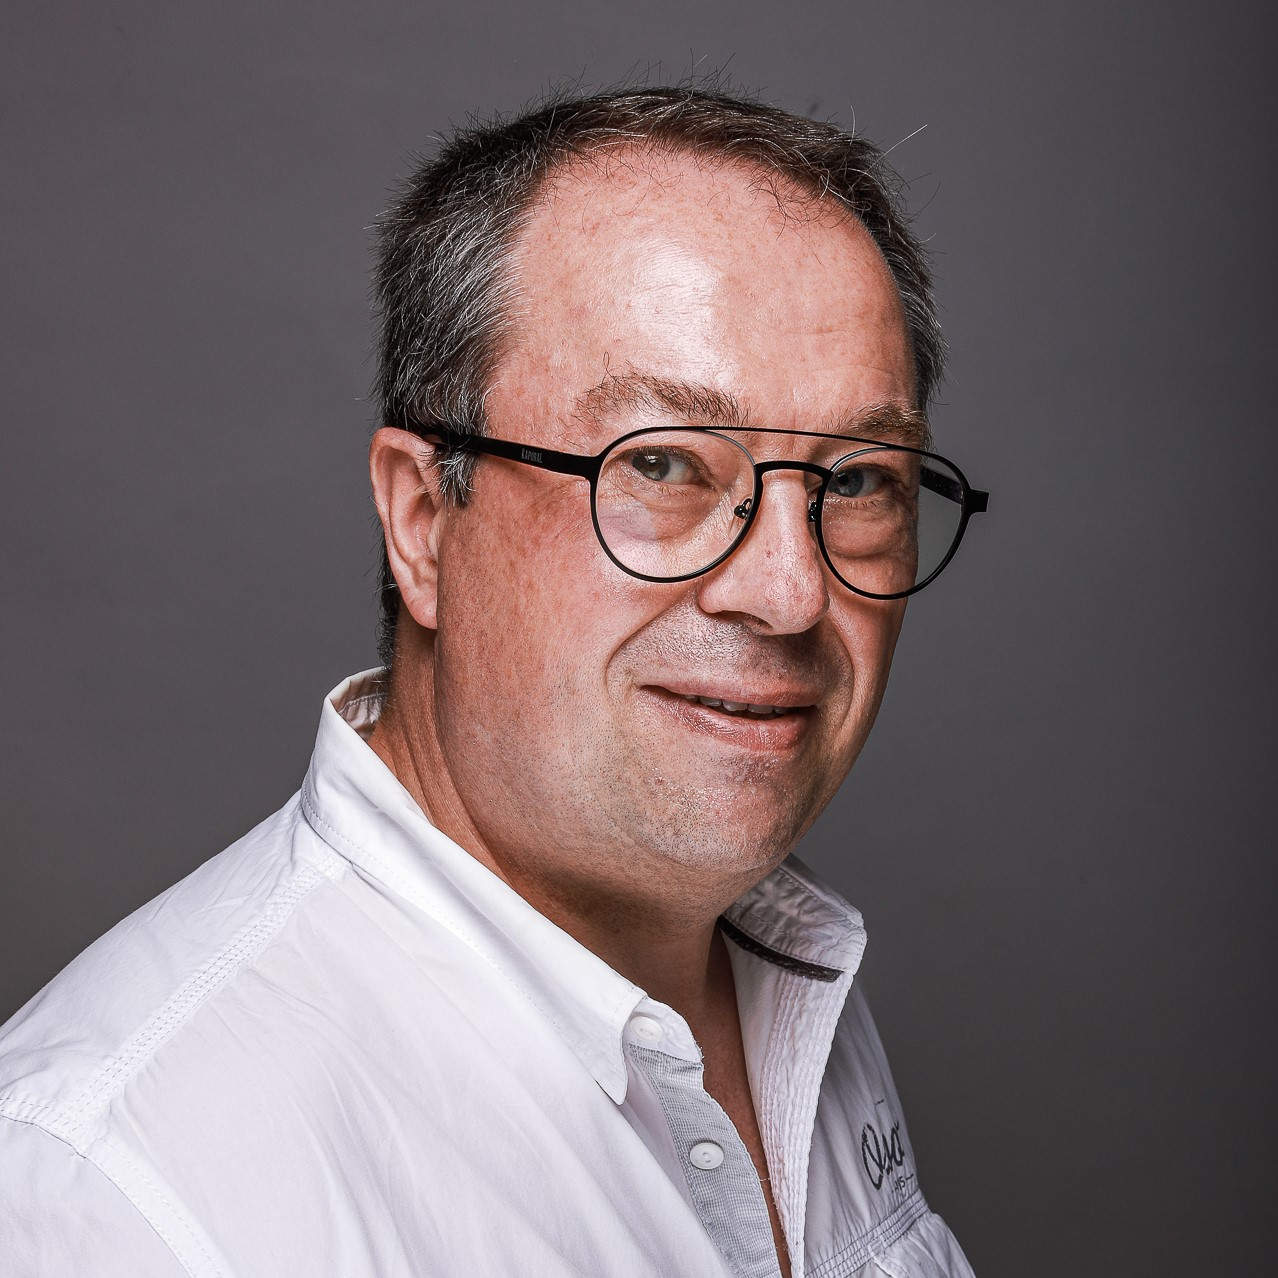 Stéphane TROLET